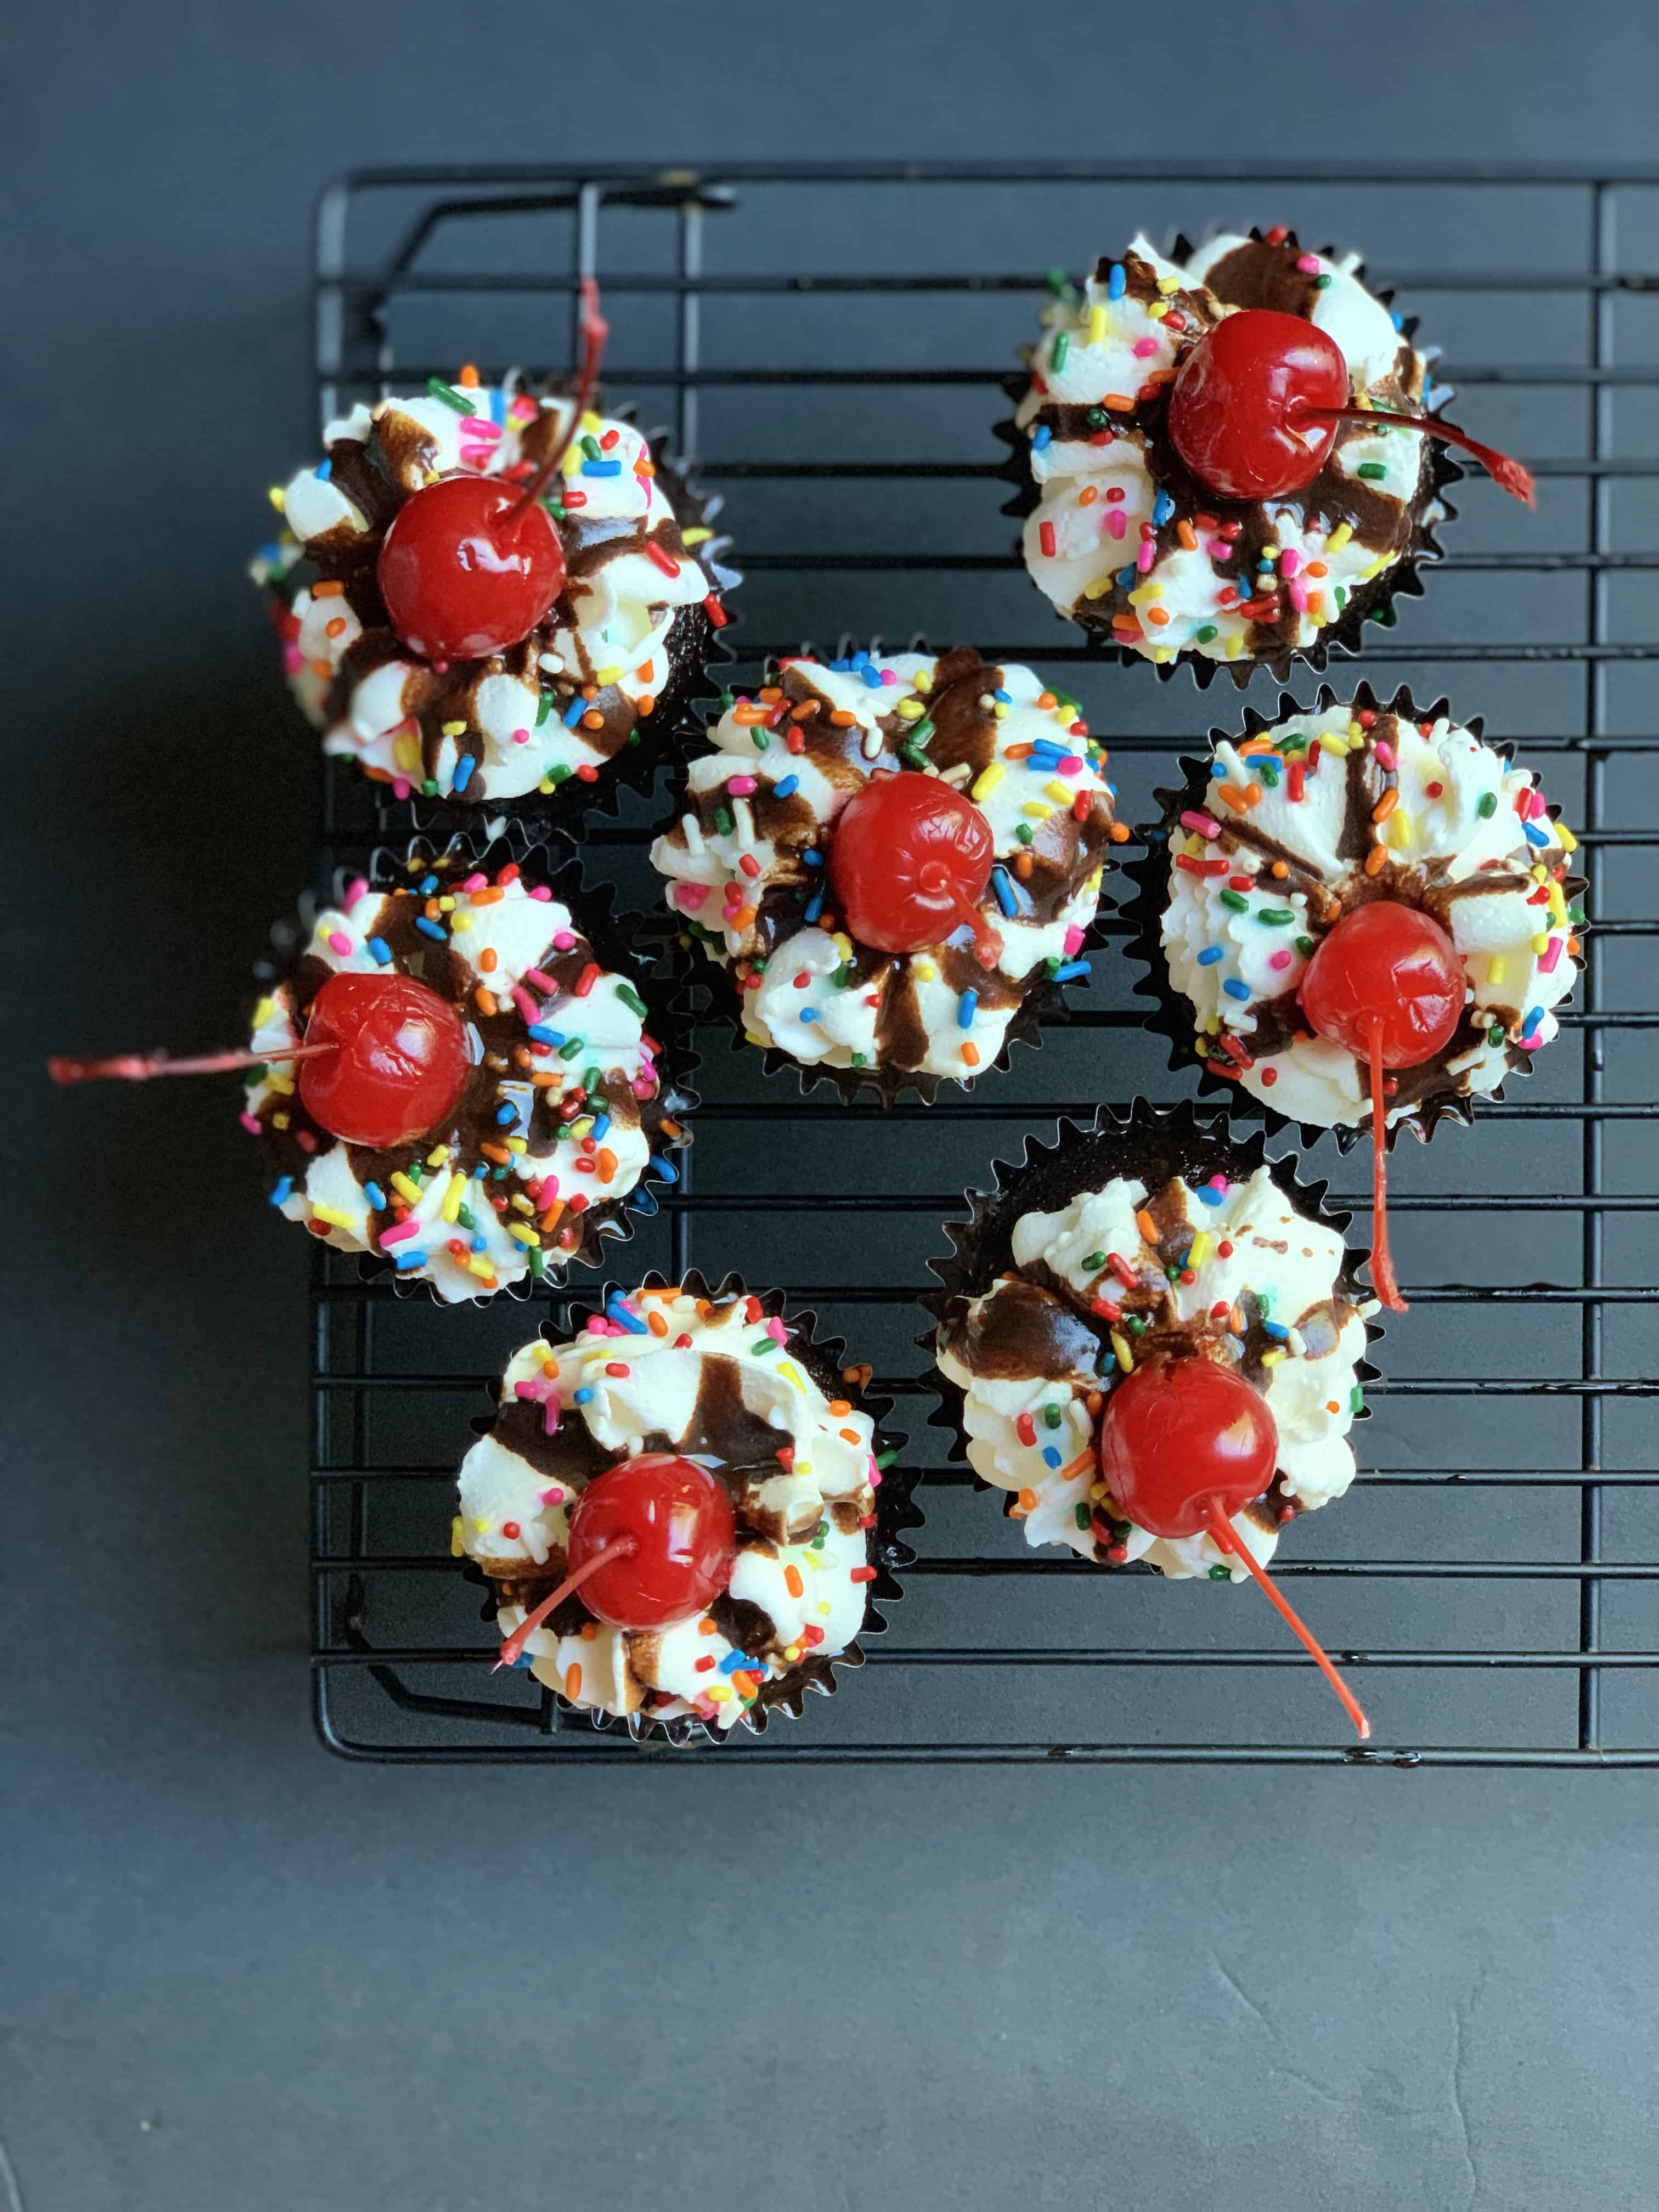 aerial view of 7 hot fudge sundae cupcakes